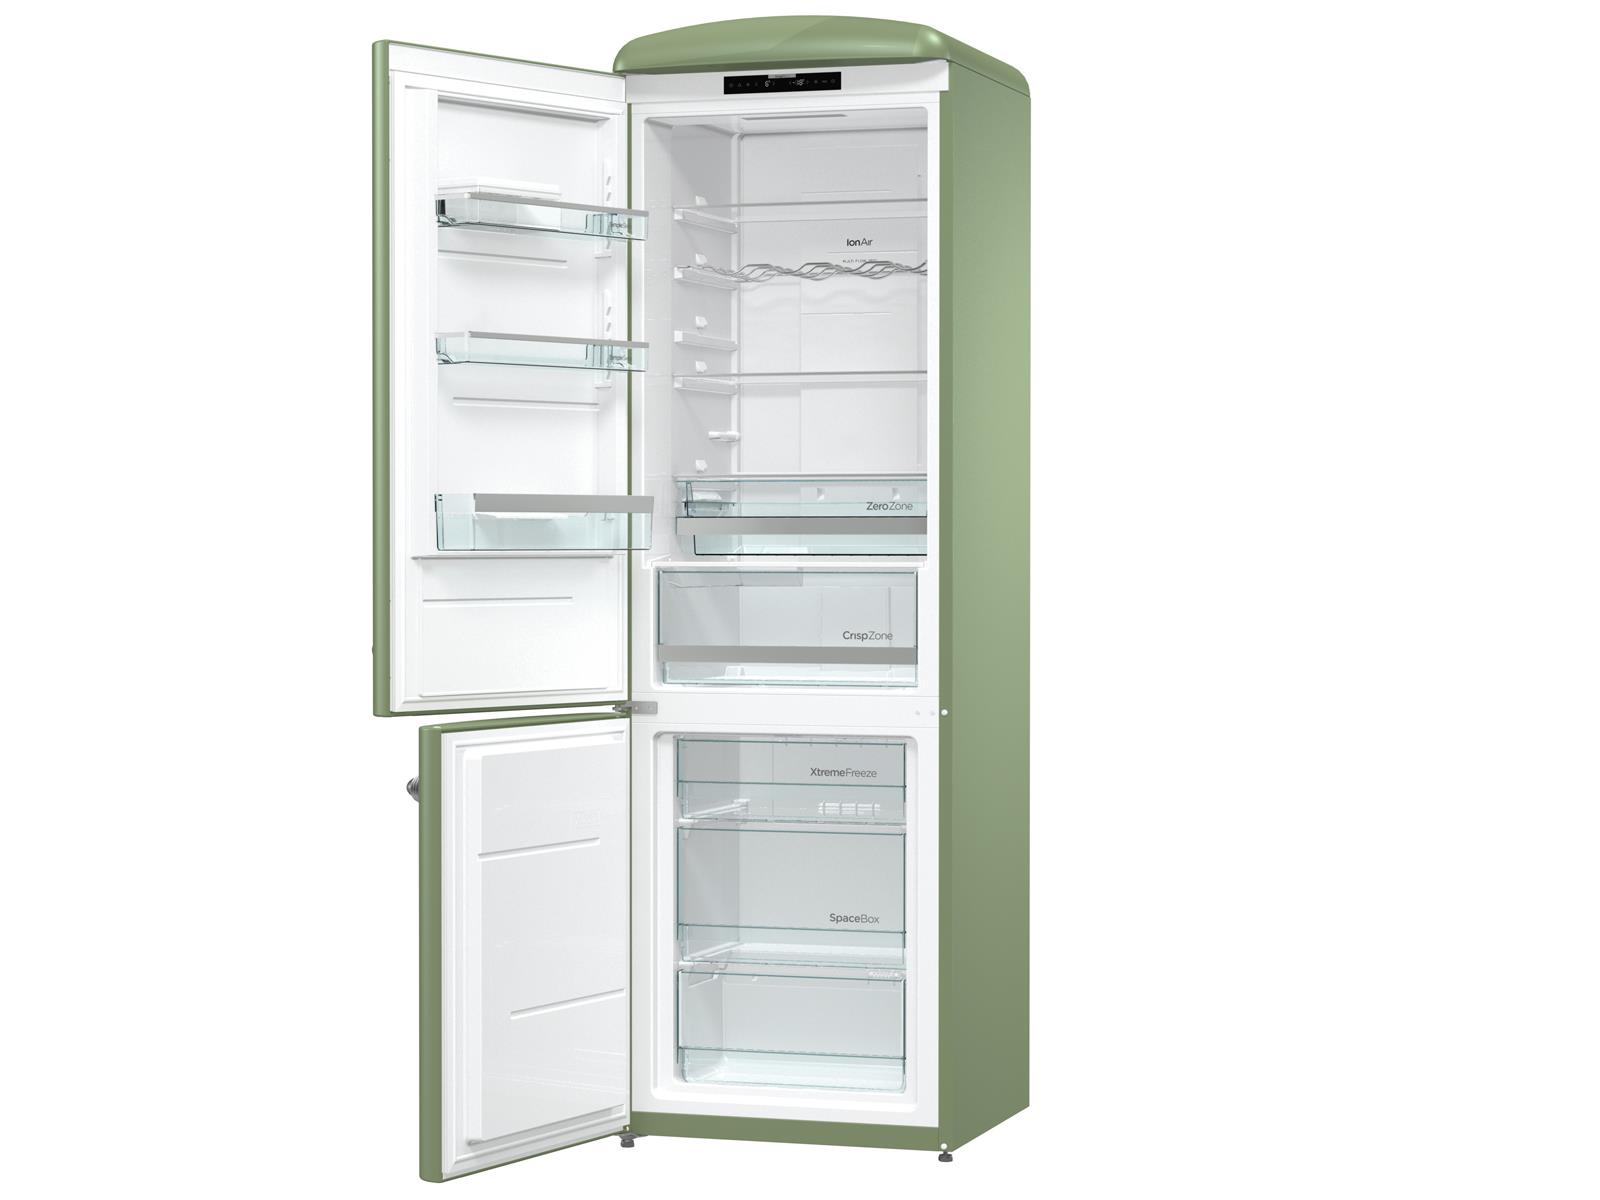 Gorenje Kühlschrank Grün : Gorenje onrk ol l kühl gefrierkombination olive grün